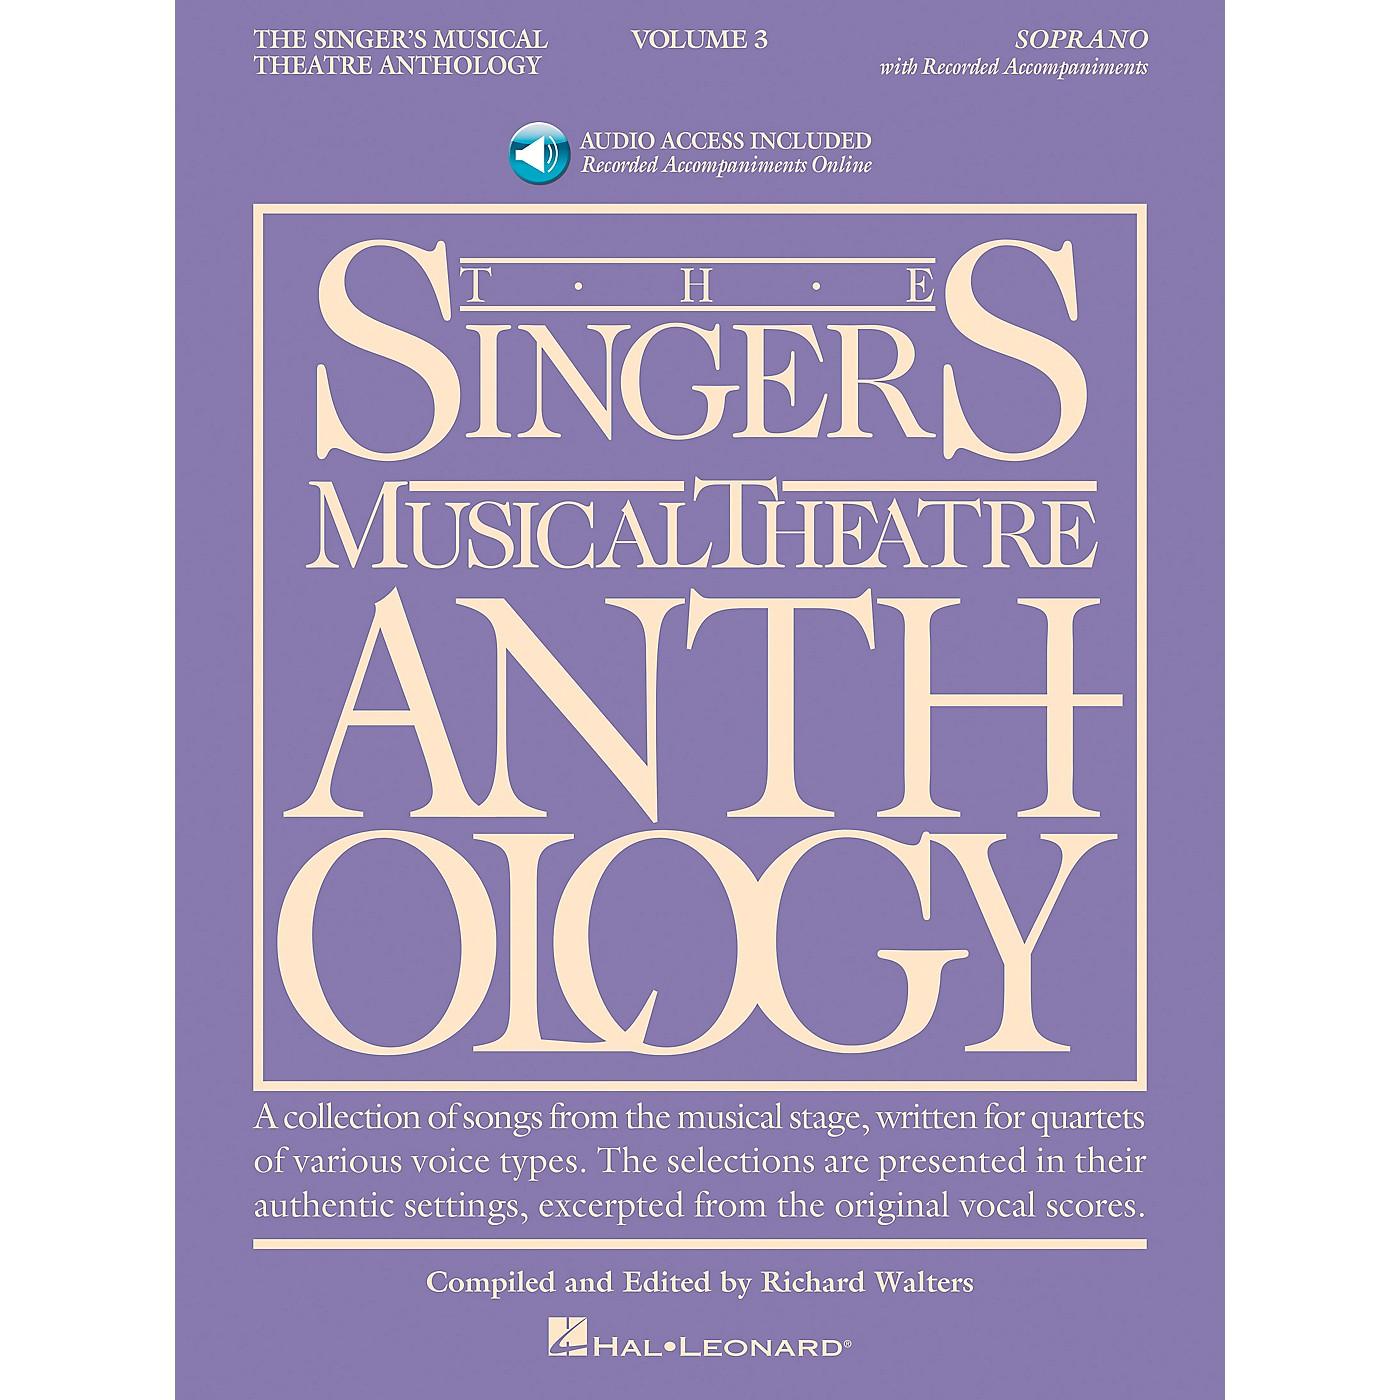 Hal Leonard Singer's Musical Theatre Anthology for Soprano Volume 3 Book/2CD's thumbnail